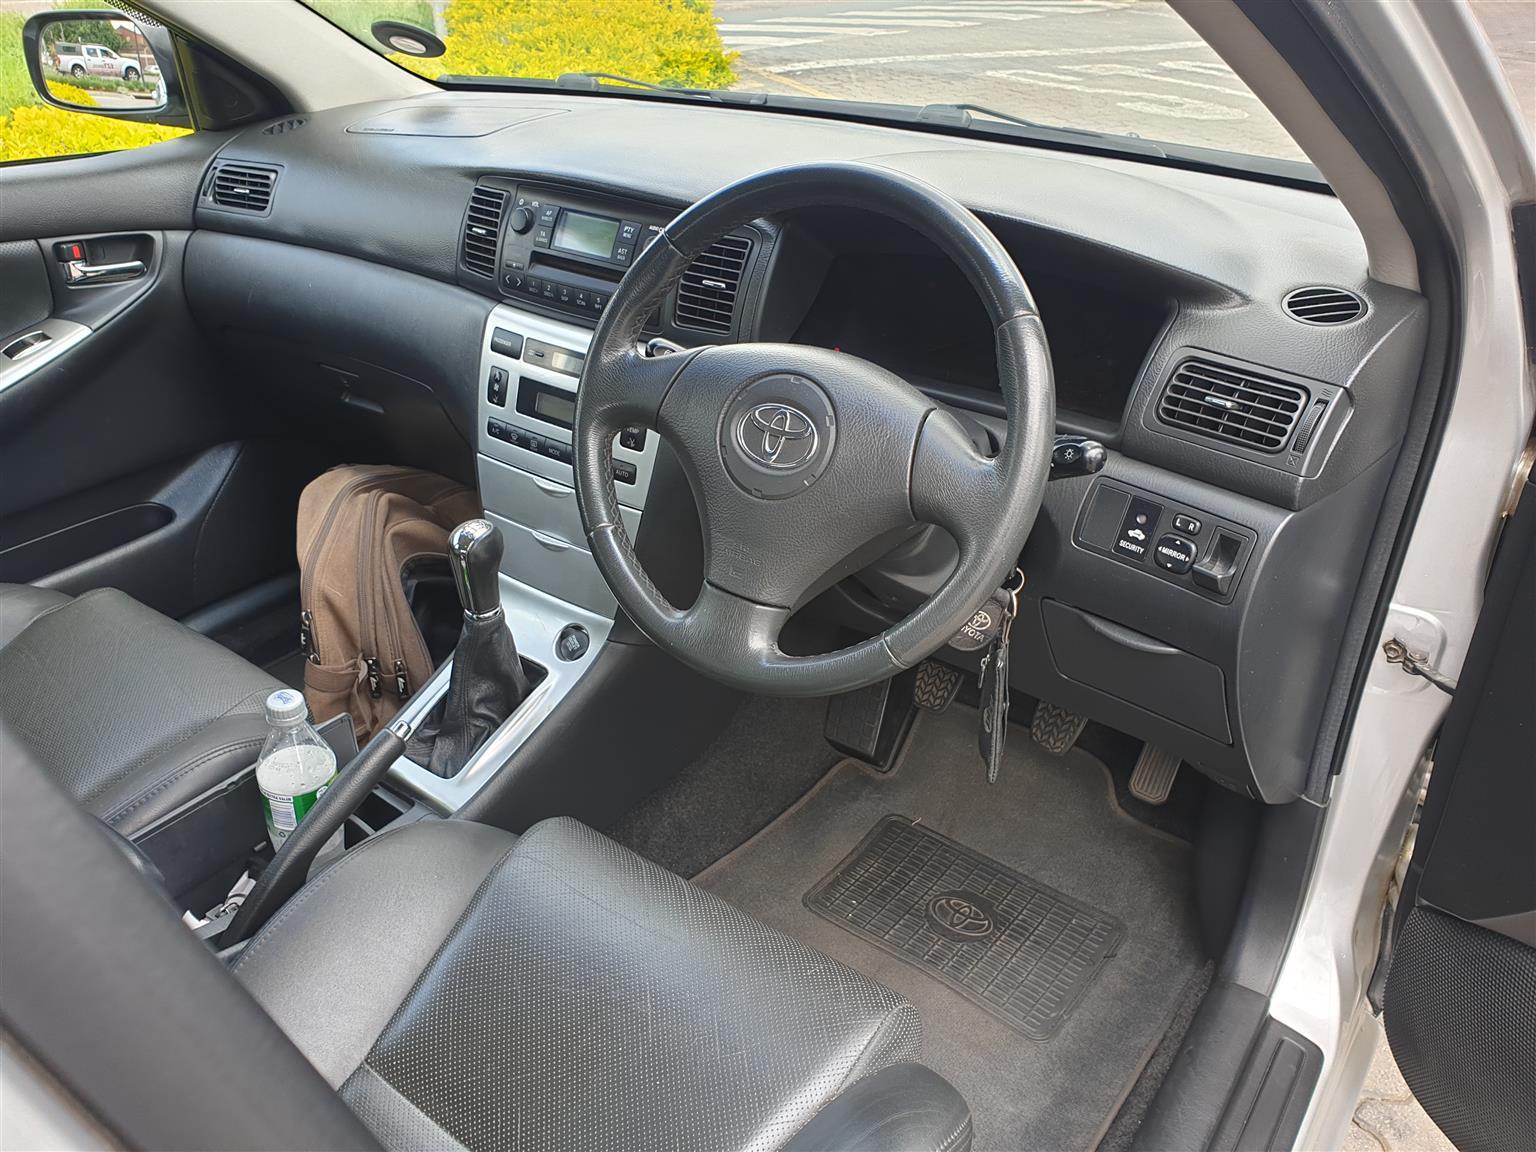 2003 Toyota RunX 180 RSi